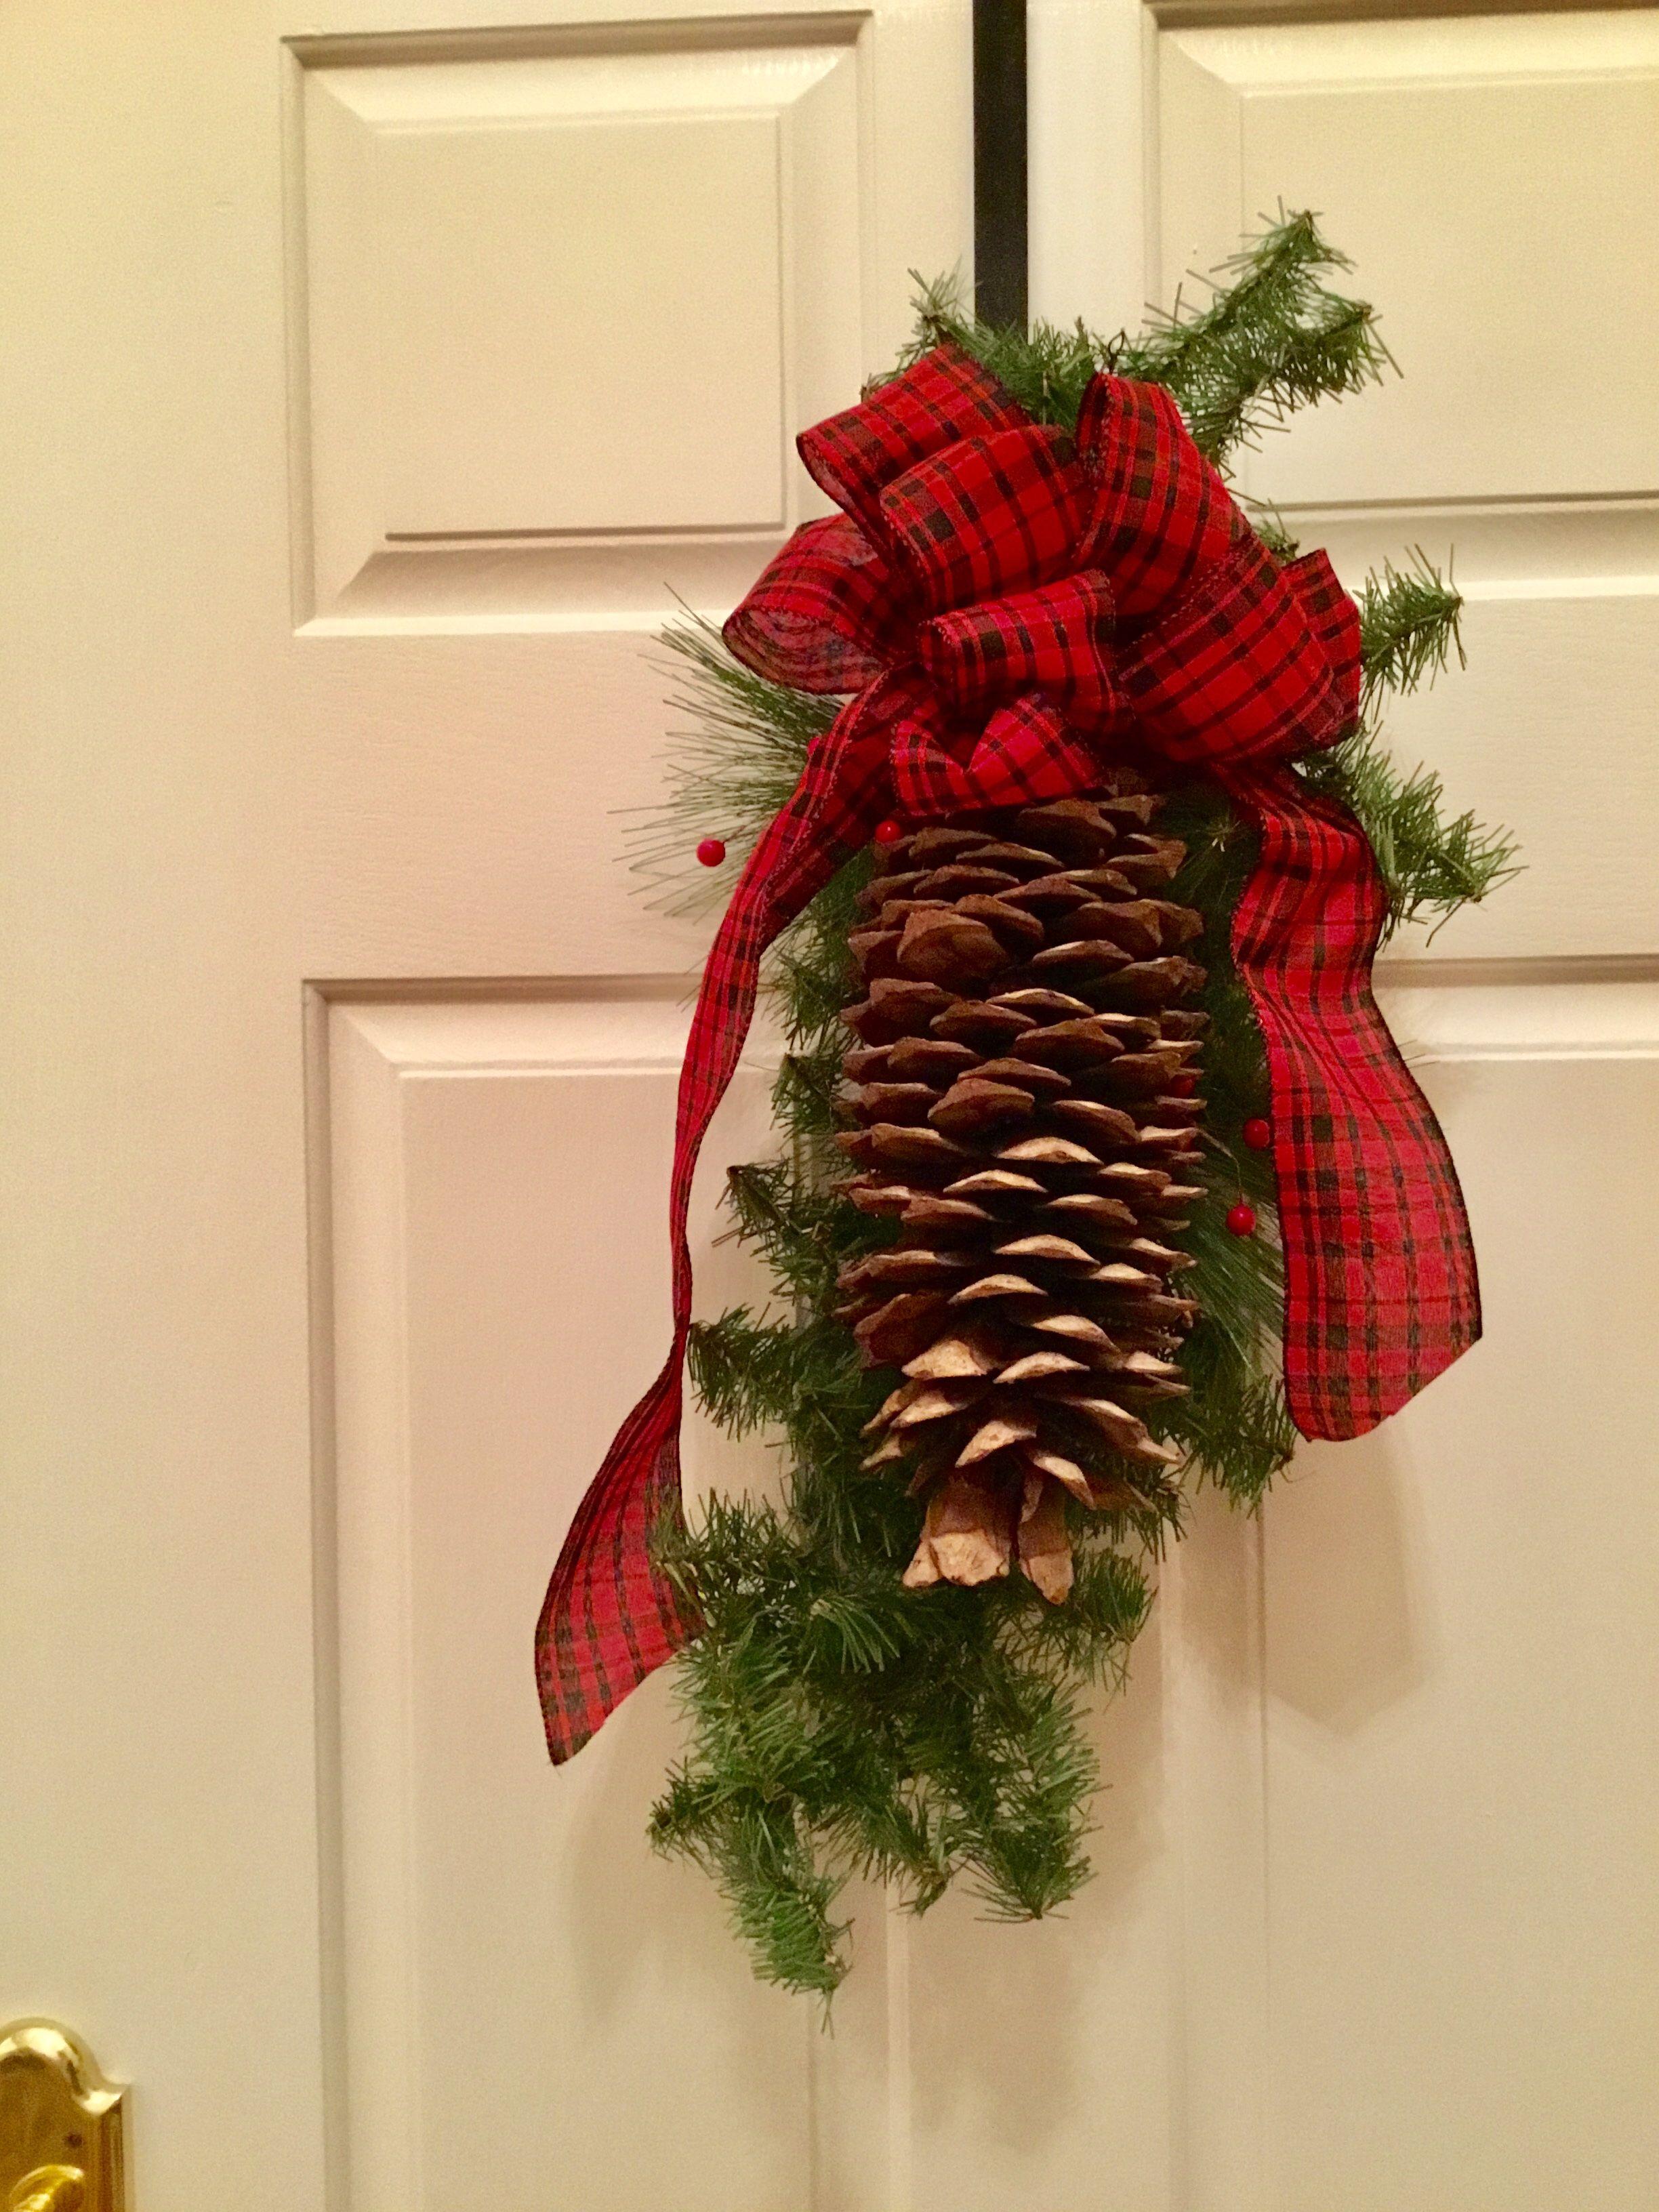 CHRISTMAS TREE DECORATIONXmas ornamentCone decorPine cone satin ornament